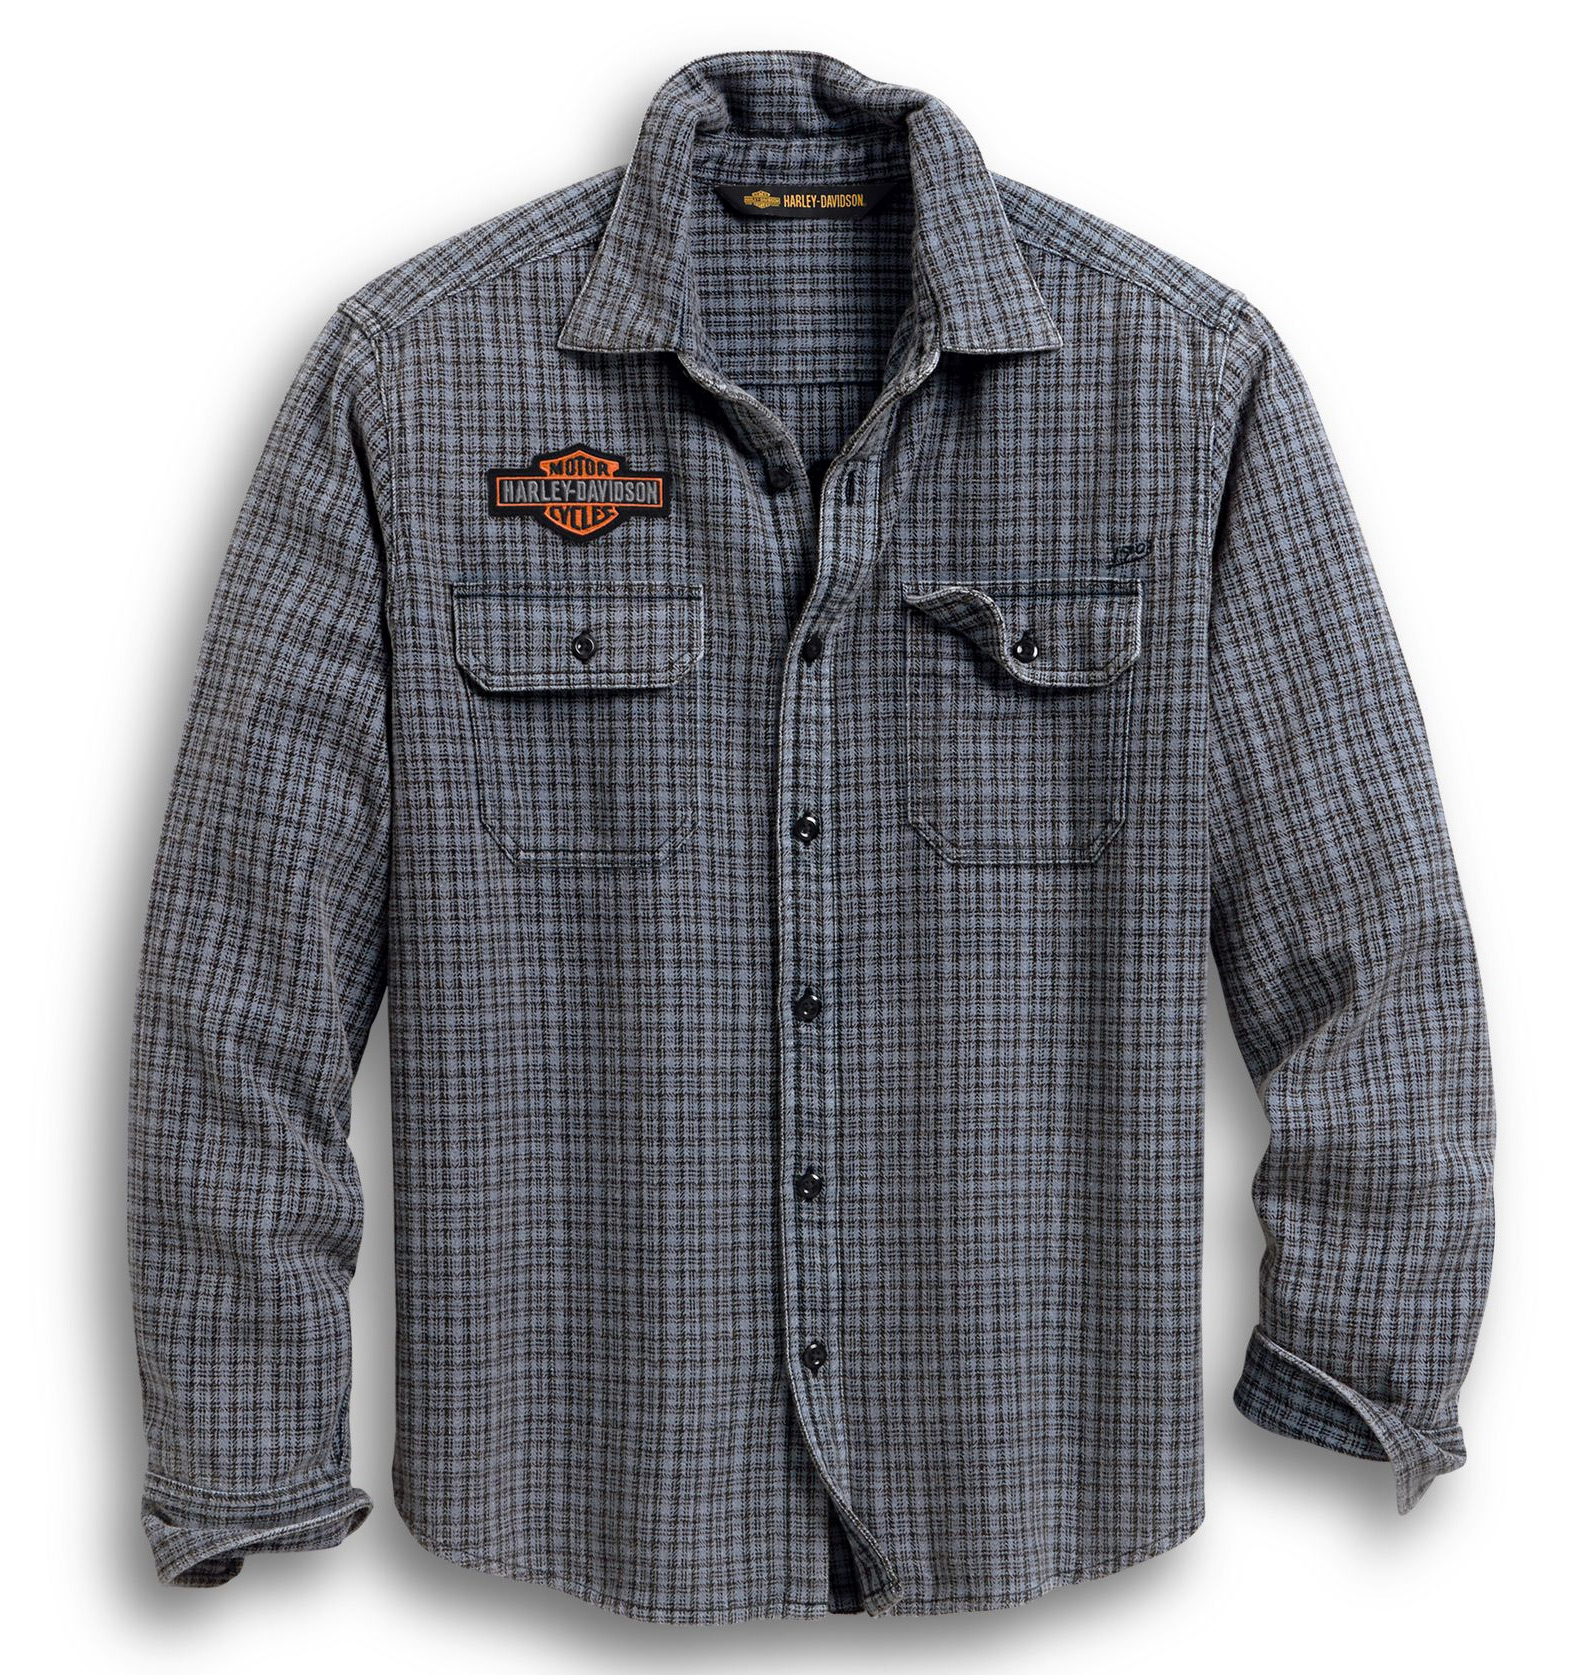 Harley Davidson HD Herren Langarm Hemd Grösse